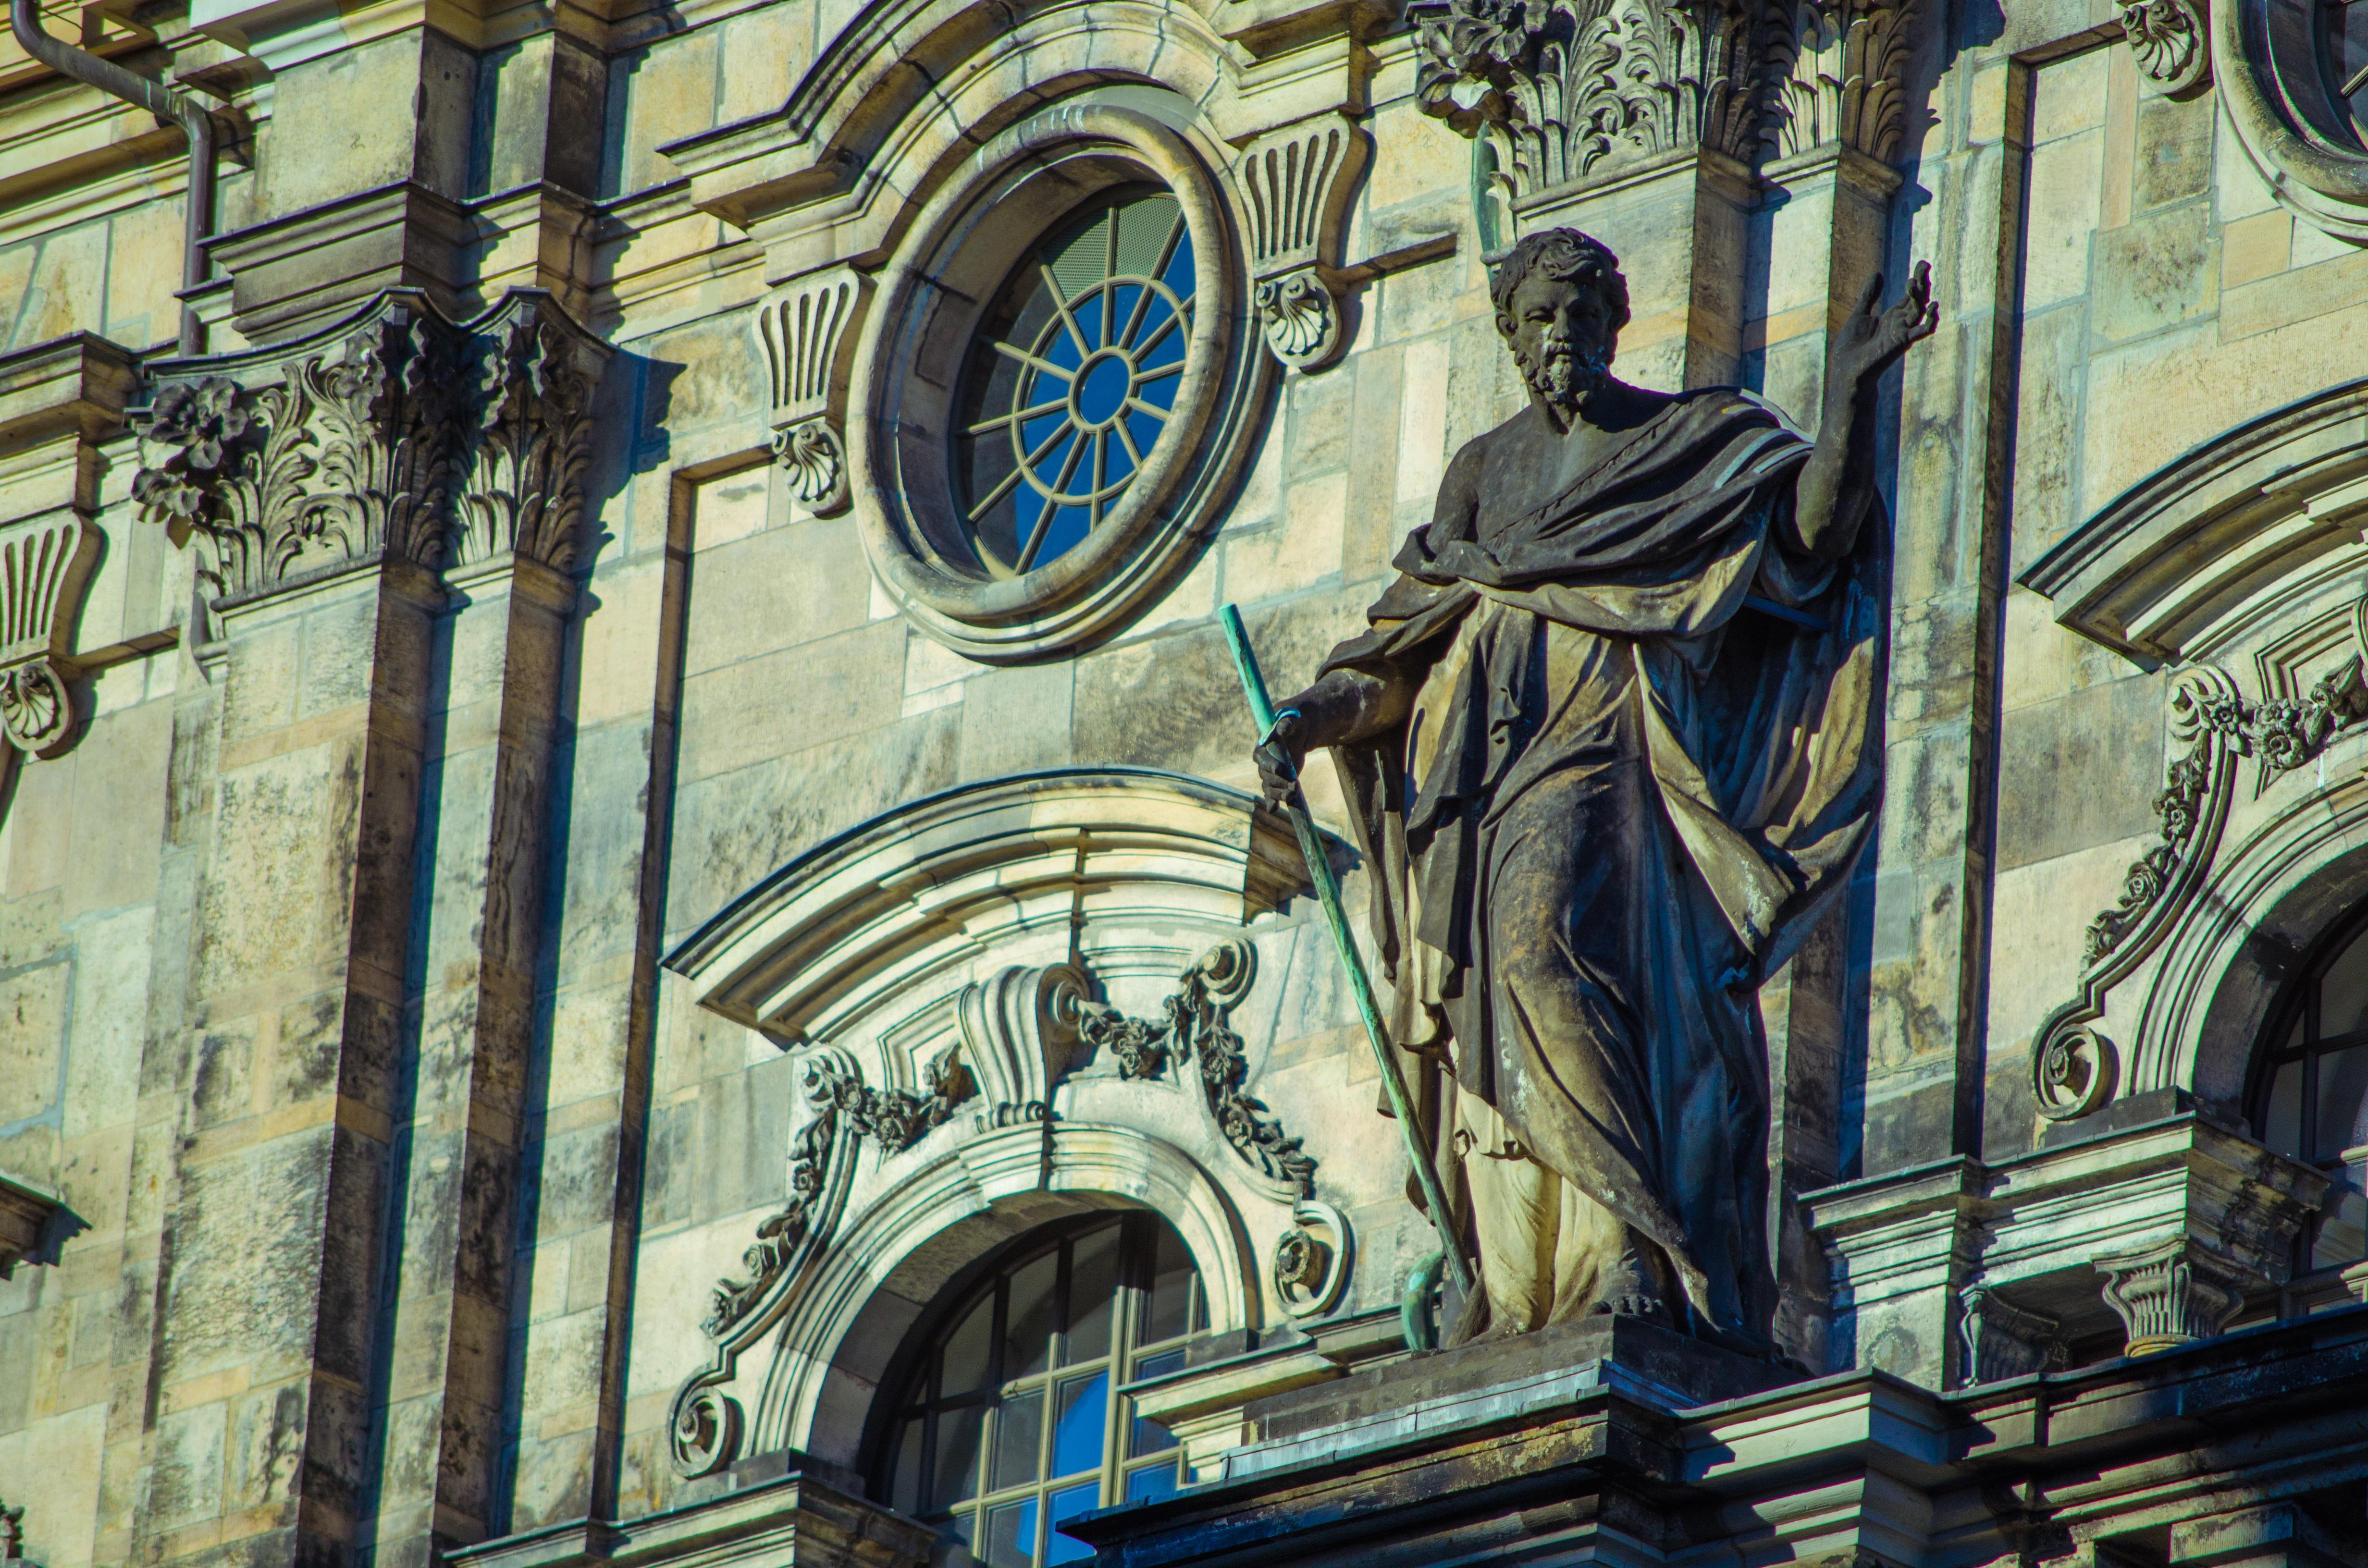 Historic Tourism Place Of Worship Sculpture Medieval Art Mural Heritage Basilica Metropolis Architectural Gothic Architecture Urban Area